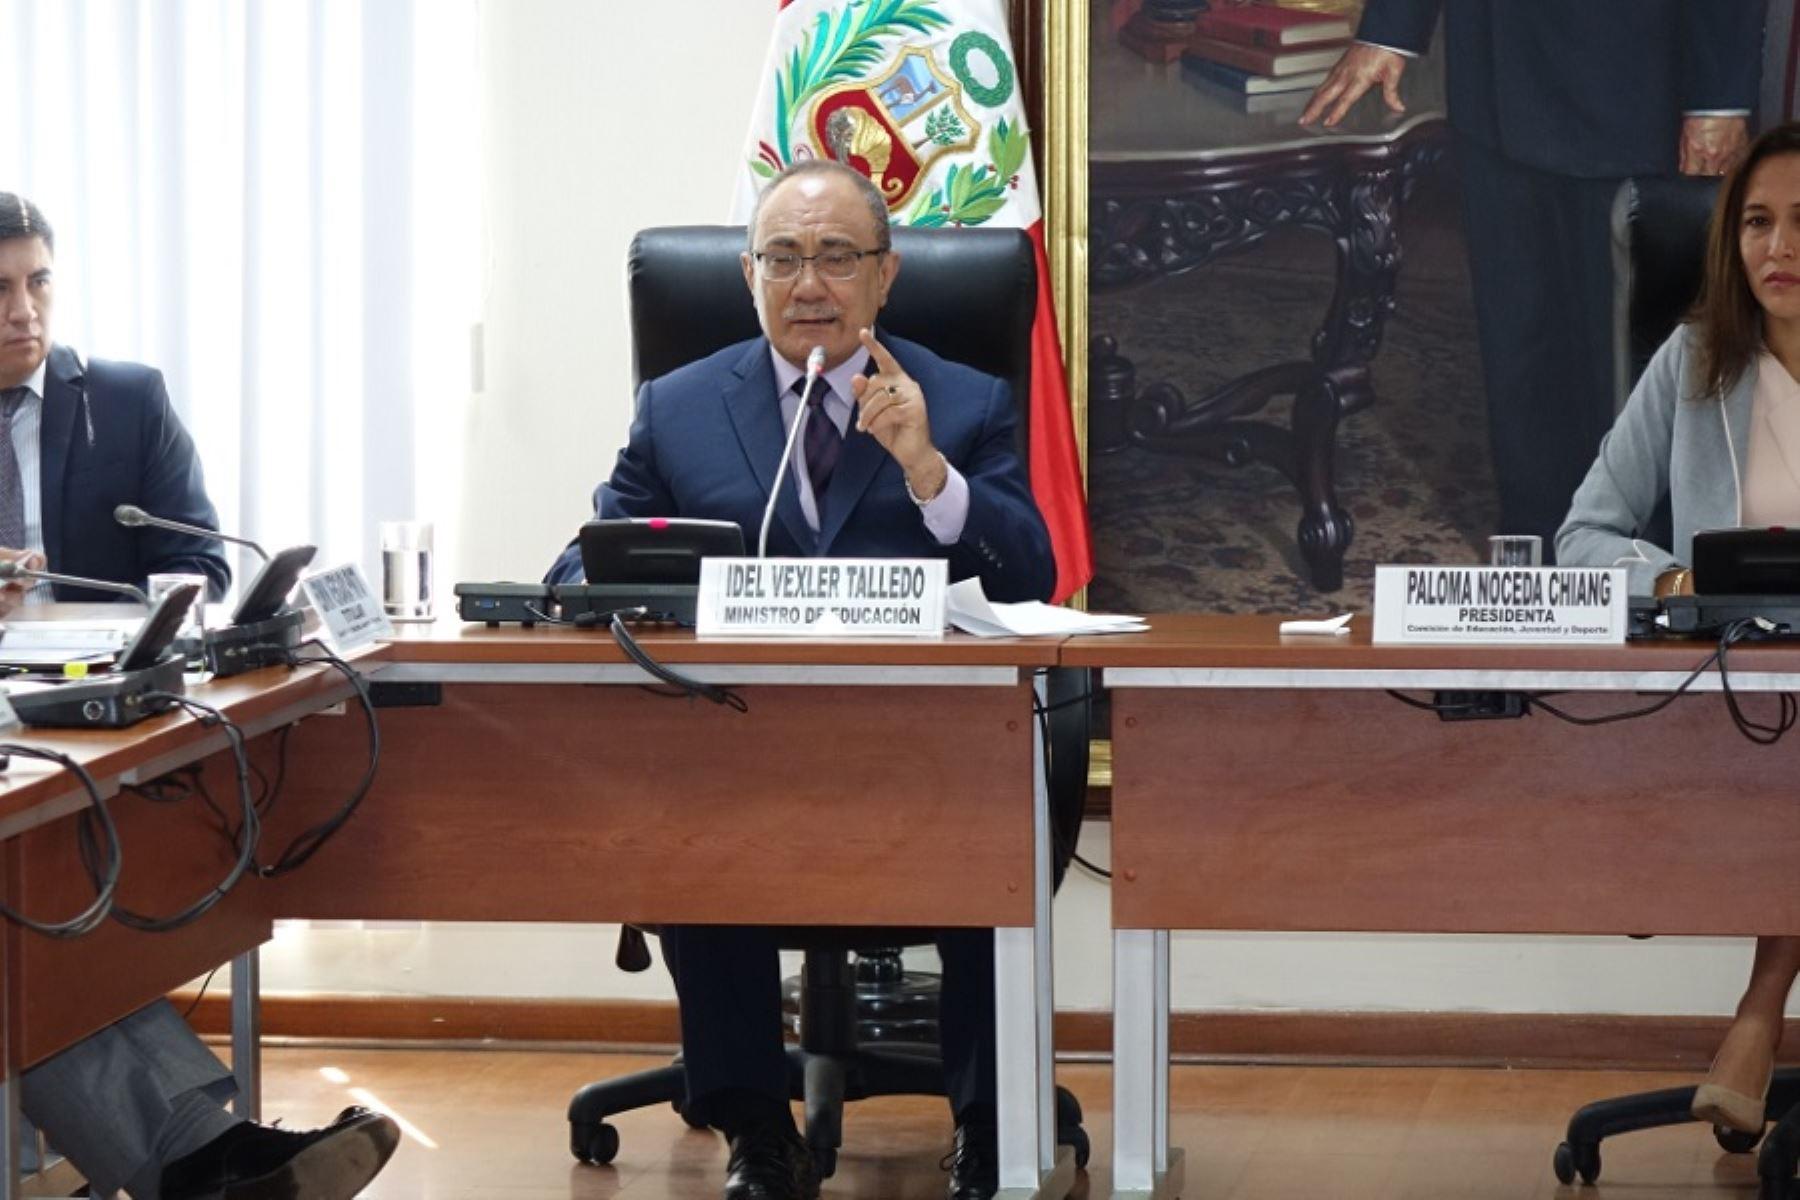 Ministro de Educación, Idel Vexler, se presentó ante Comisión de Educación de Congreso. Foto: Andina/Difusión.